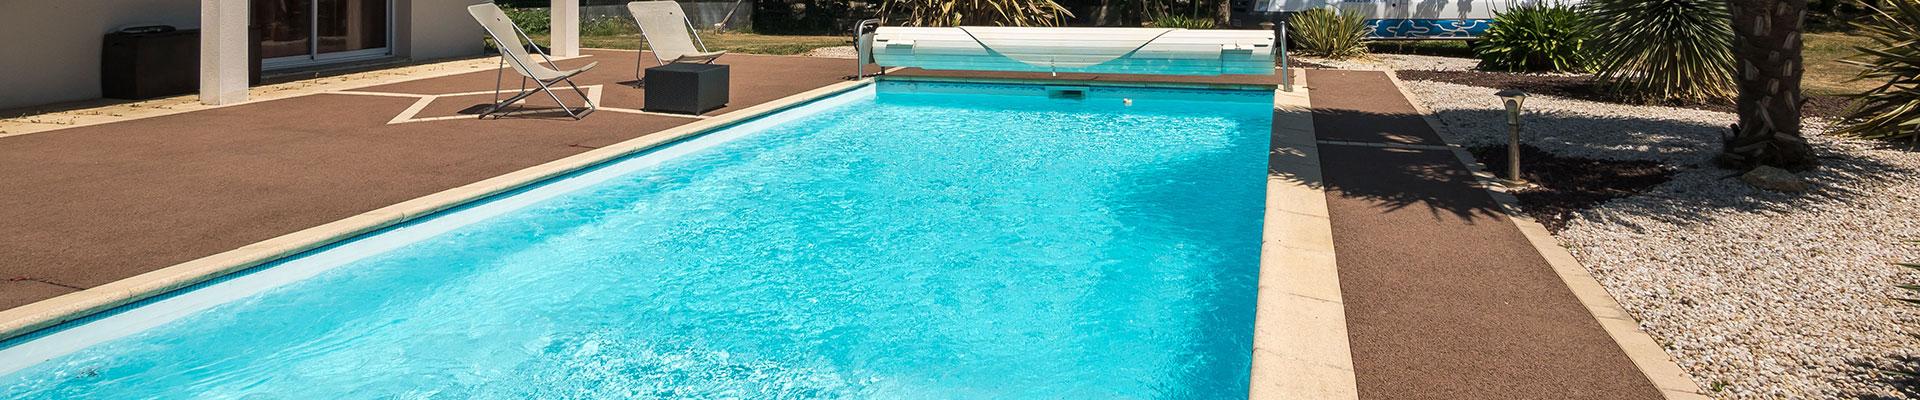 entretien piscine Vendée